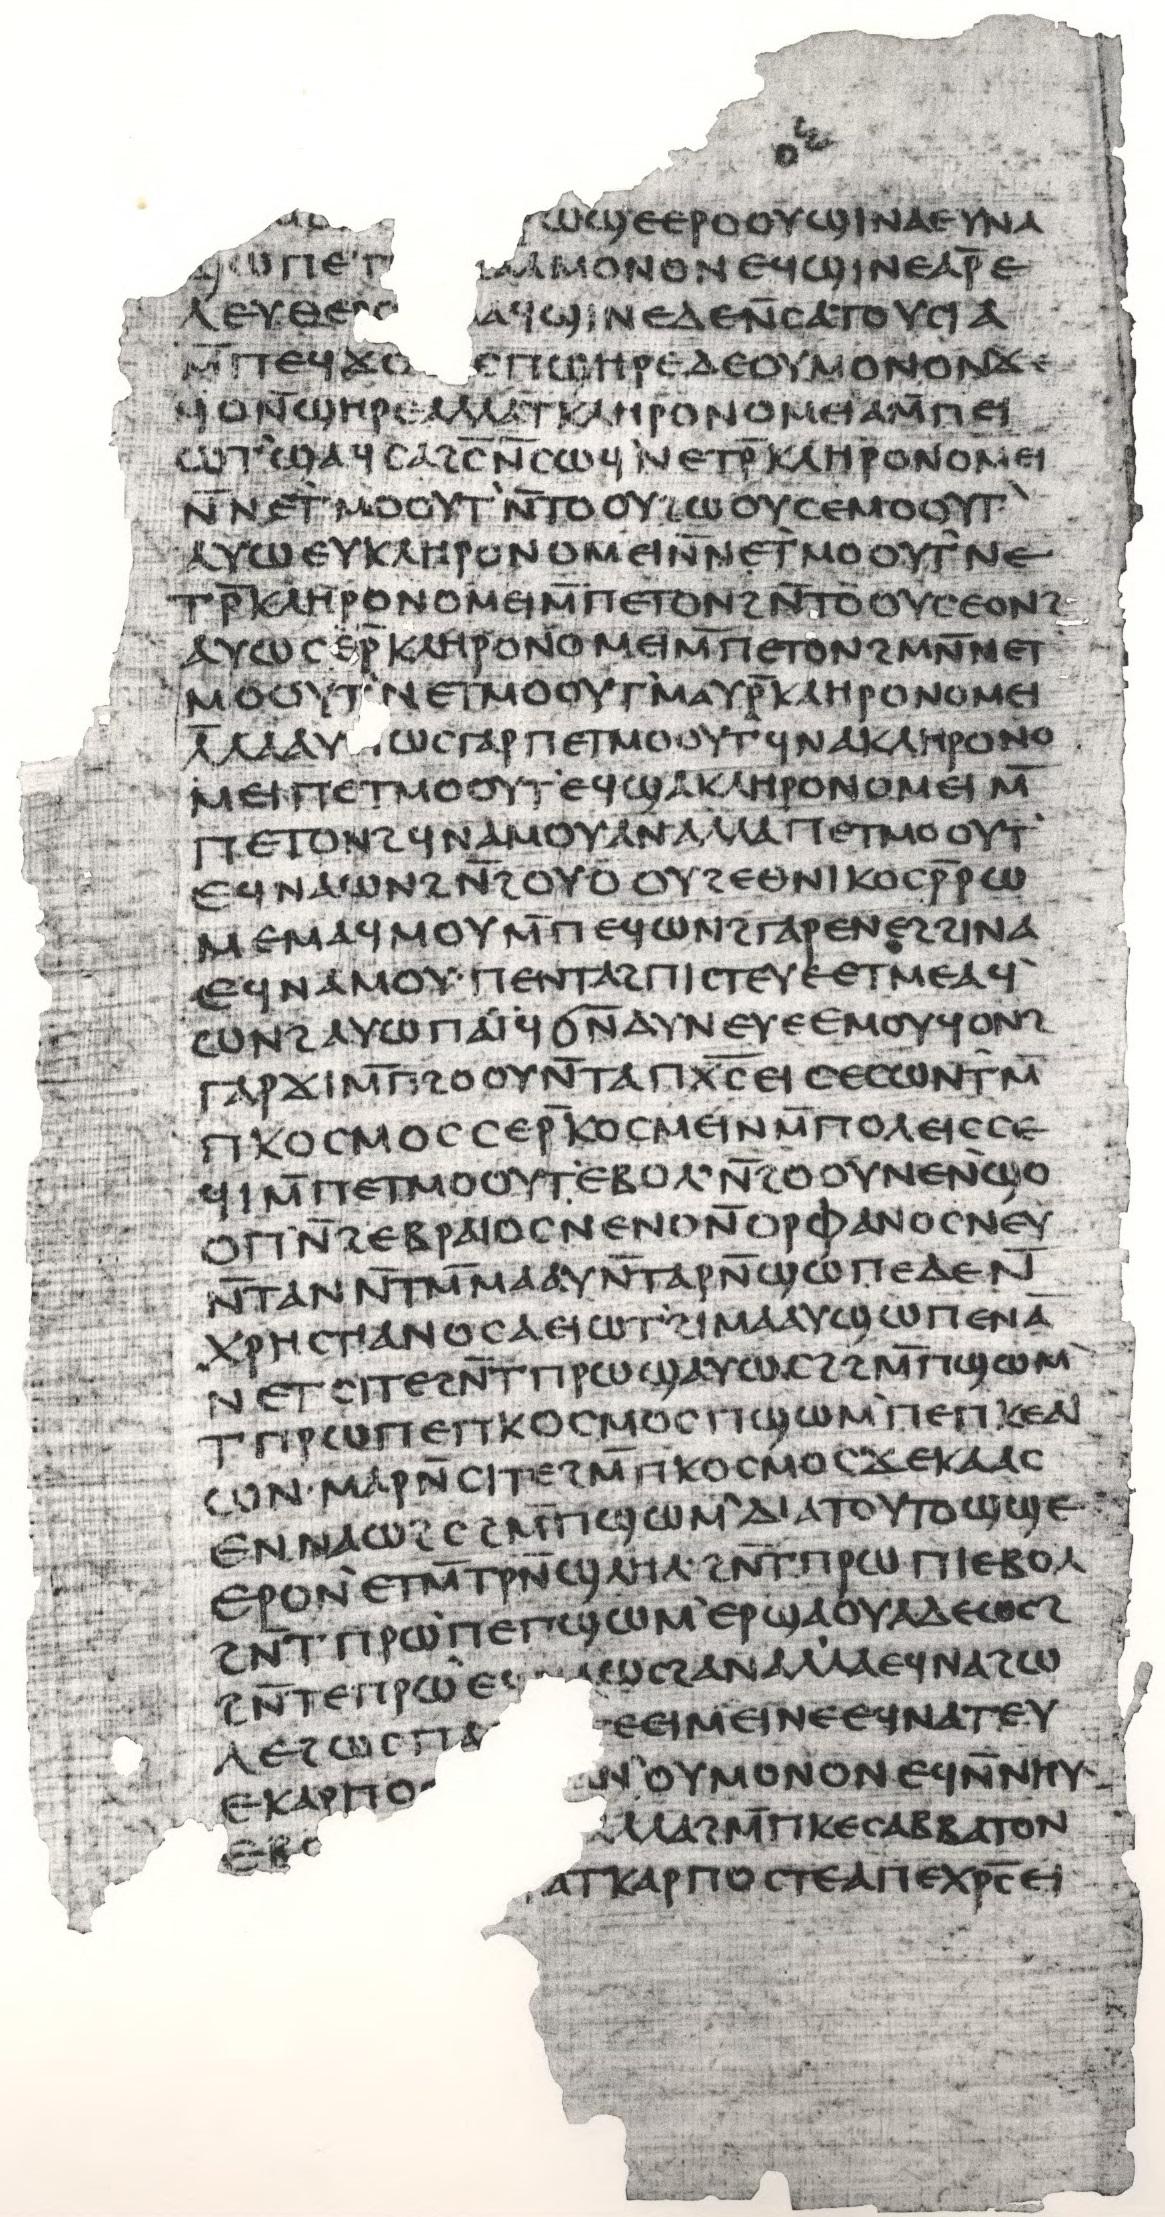 Gospel_of_Philip_facsimile_Page_52.jpg